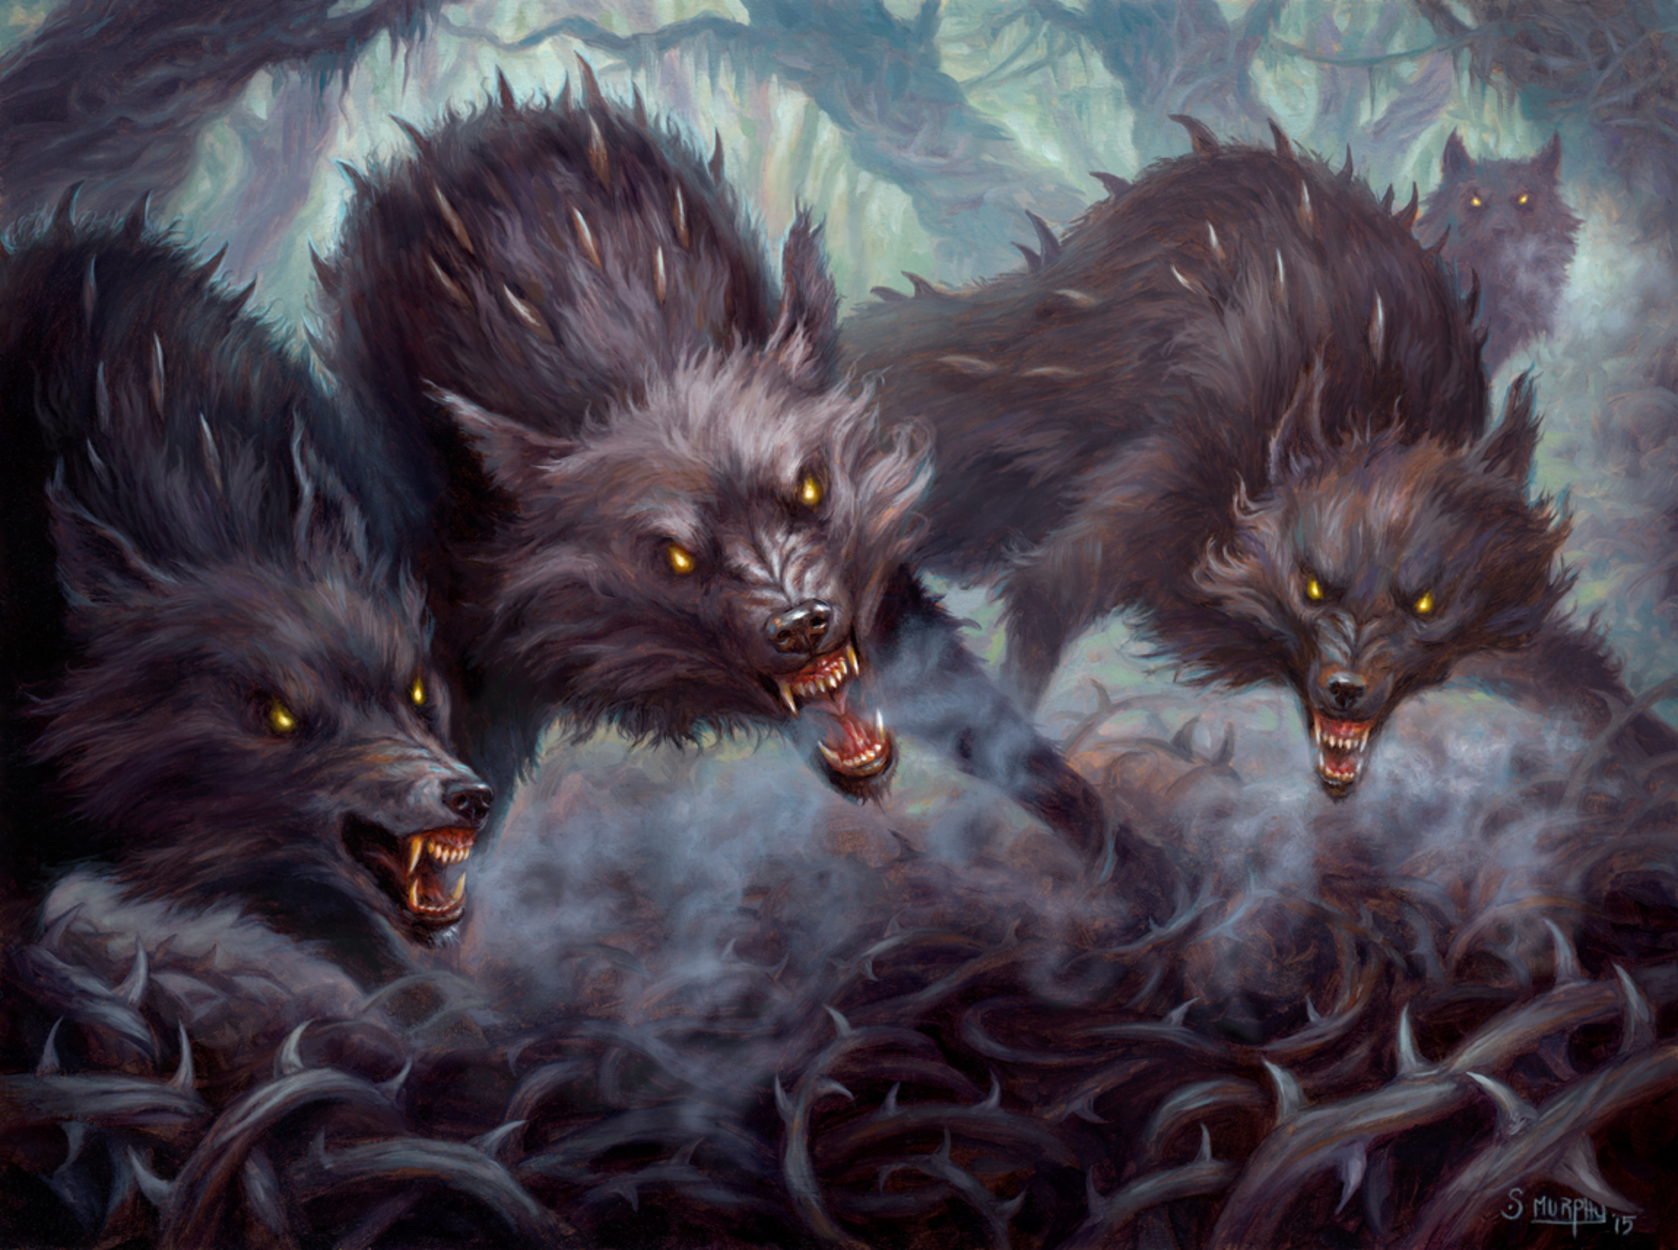 Thornhide Wolves Artwork by Scott Murphy